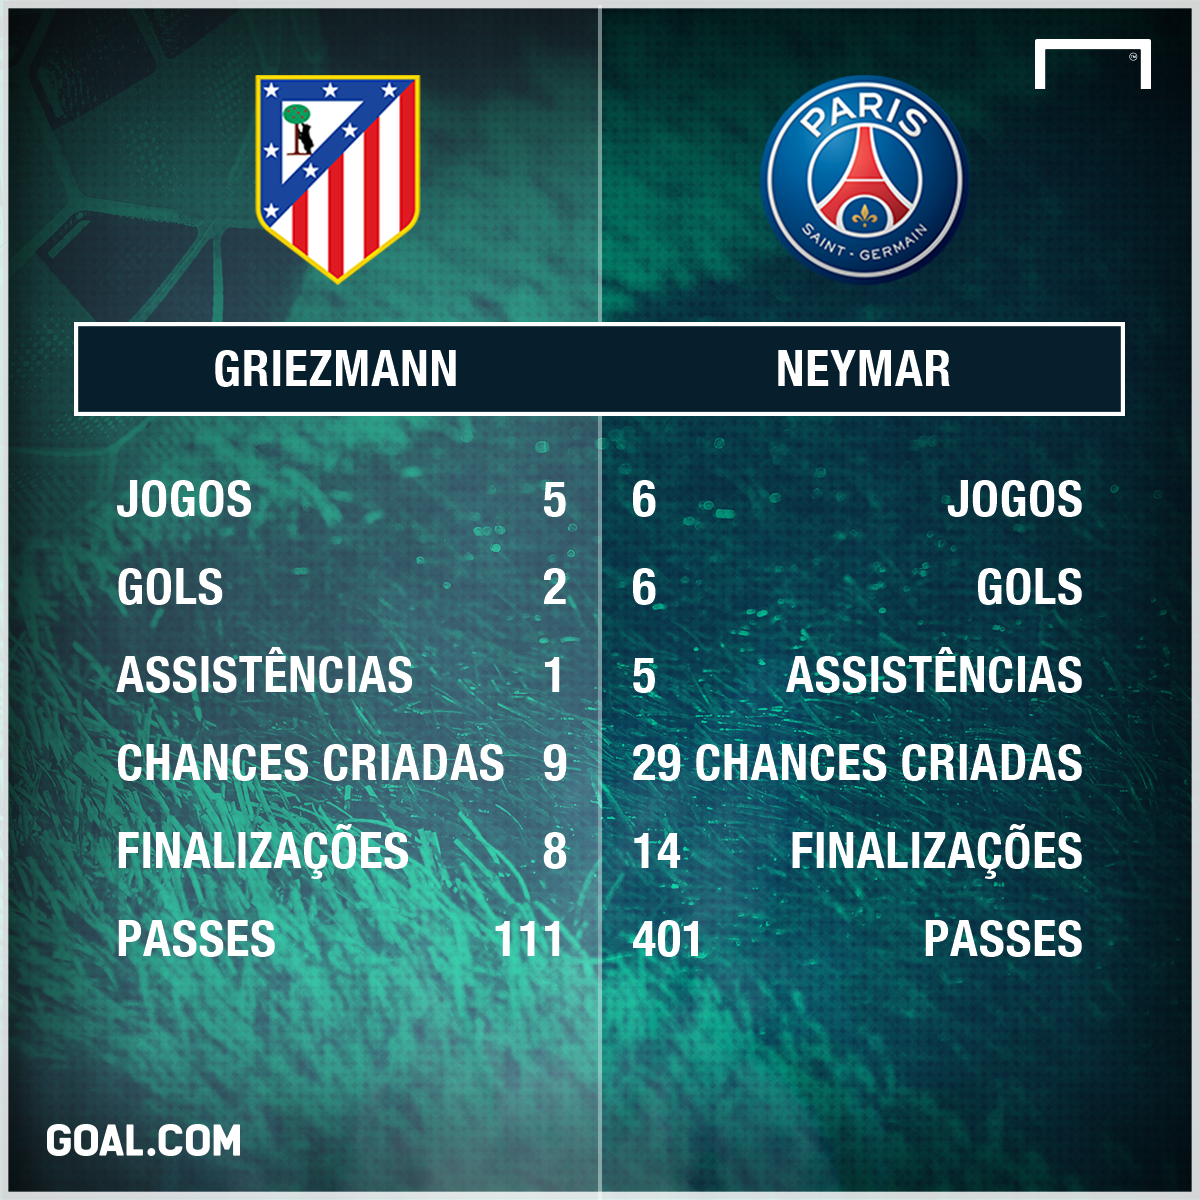 GFX Griezmann Atlético de Madrid La Liga Neymar PSG Ligue 1